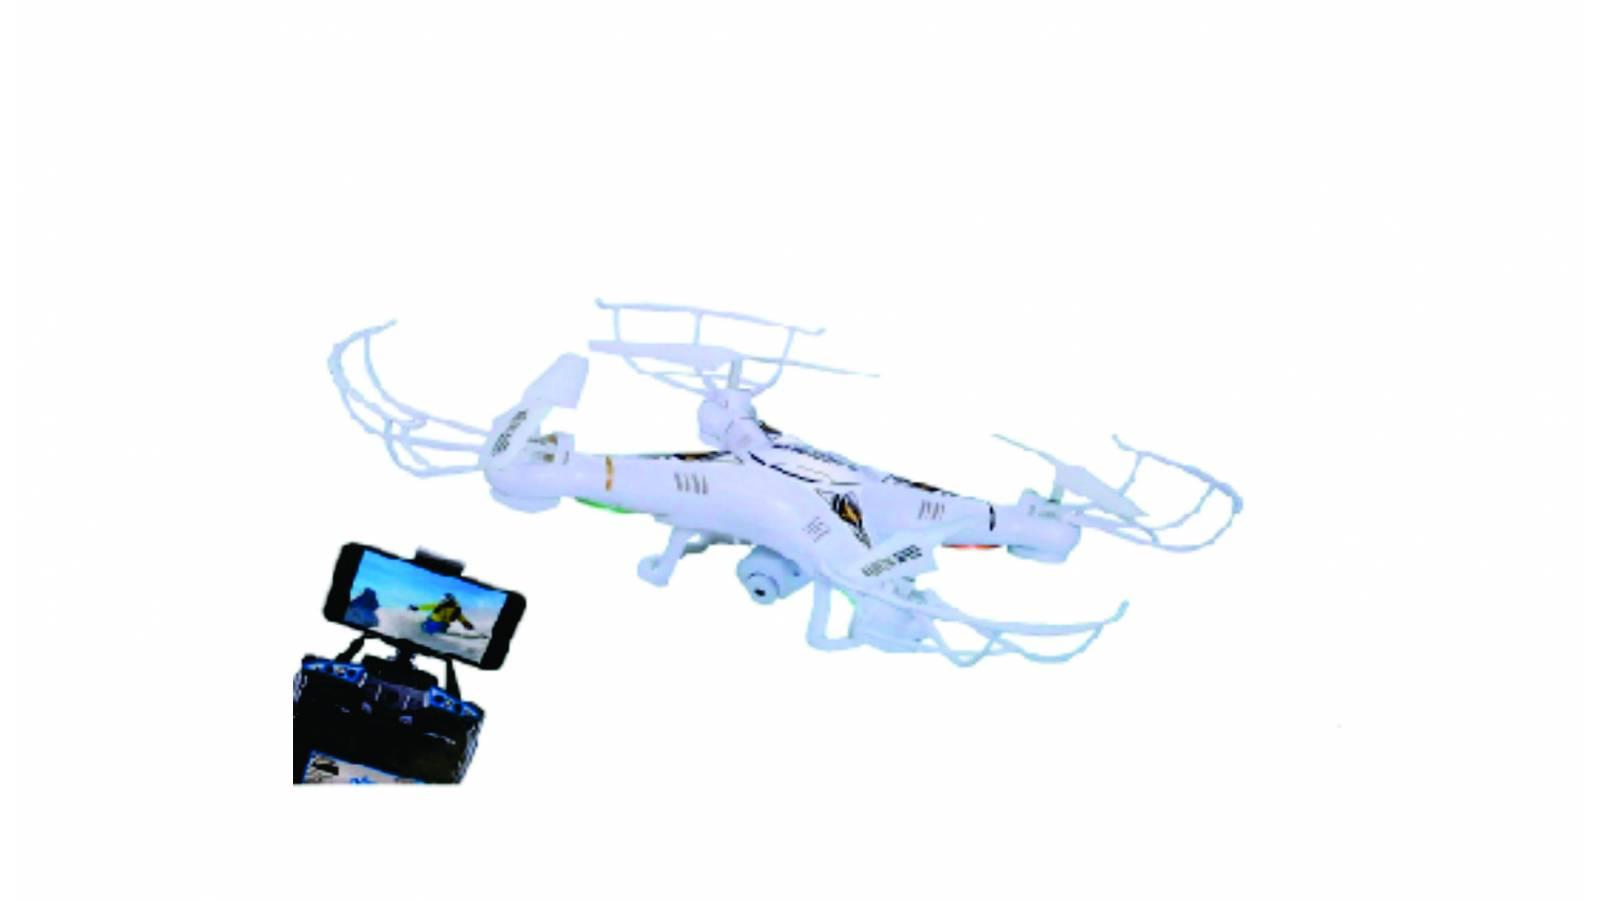 DRONE C LENTES VR